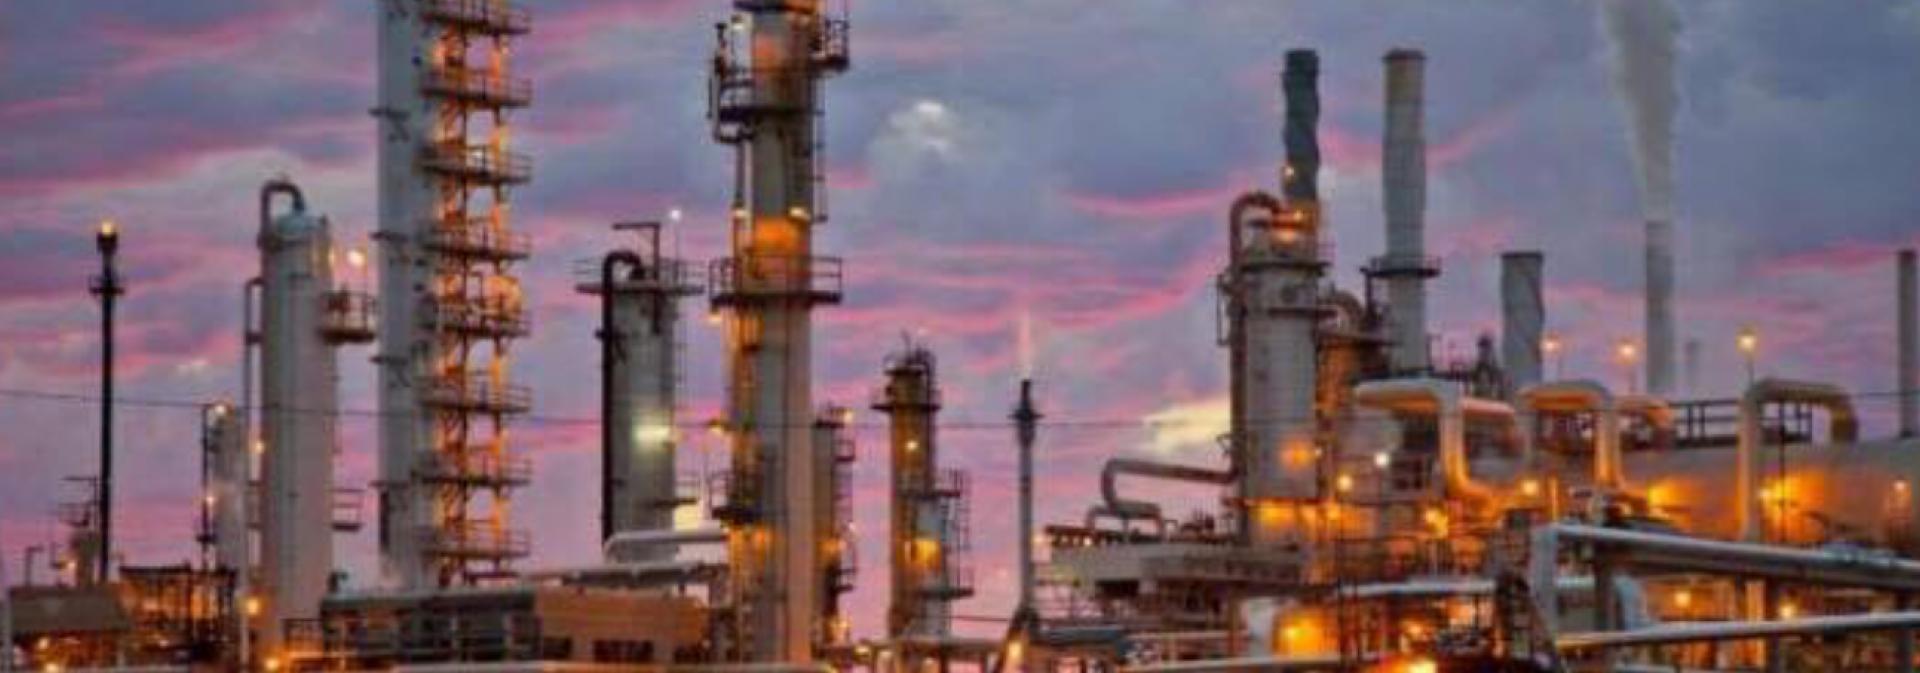 Refinery night